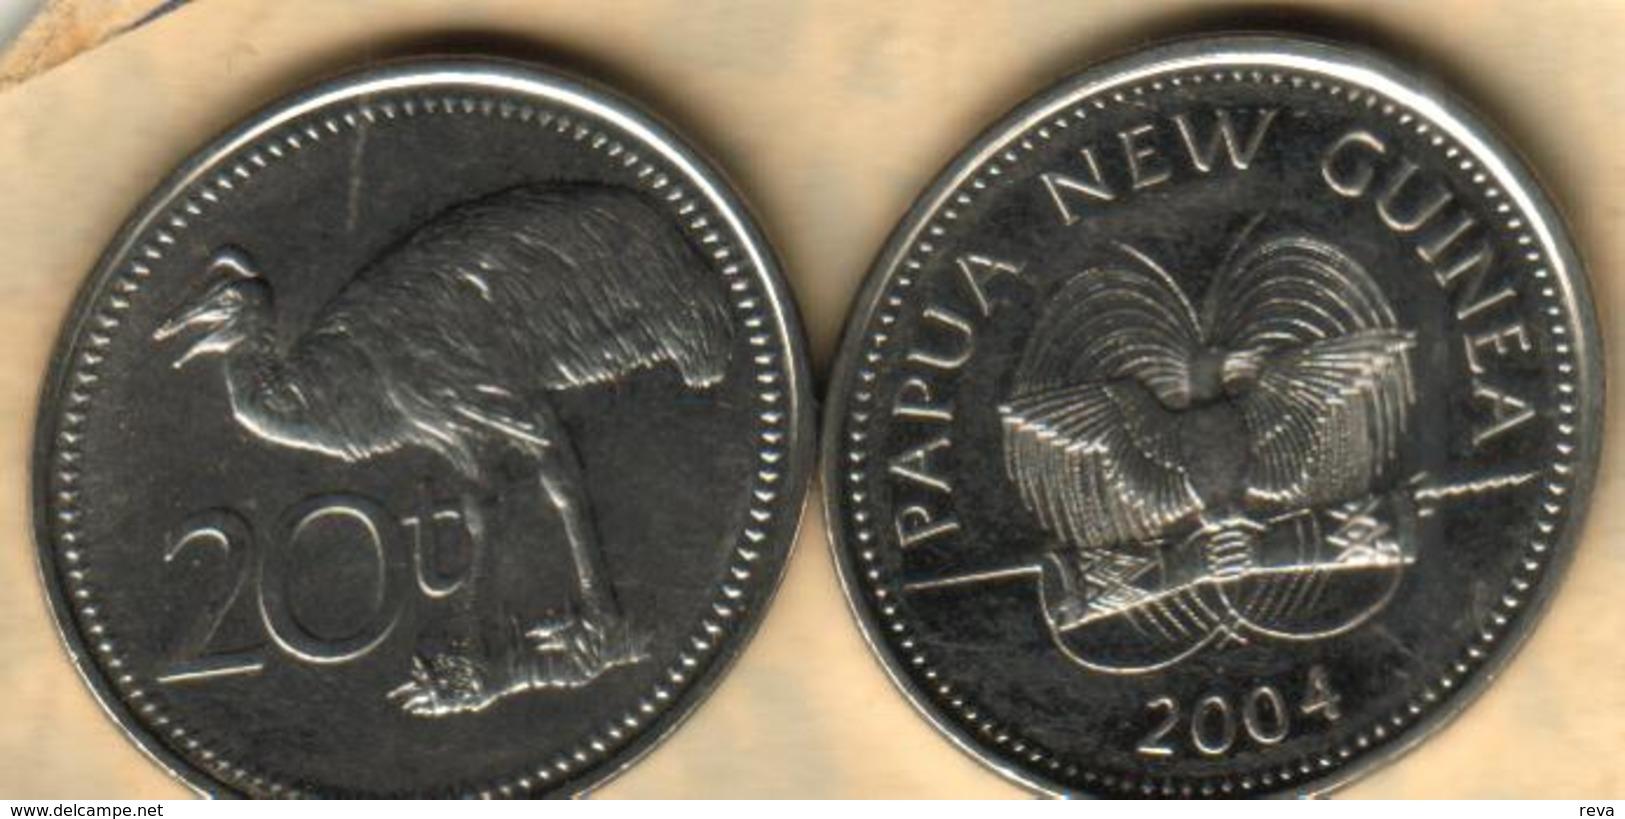 PAPUA NEW GUINEA 20 TOEA EMU BIRD FRONT BIRD EMBLEM BACK 2004 VF KM5 READ DESCRIPTION CAREFULLY!! - Papua-Neuguinea